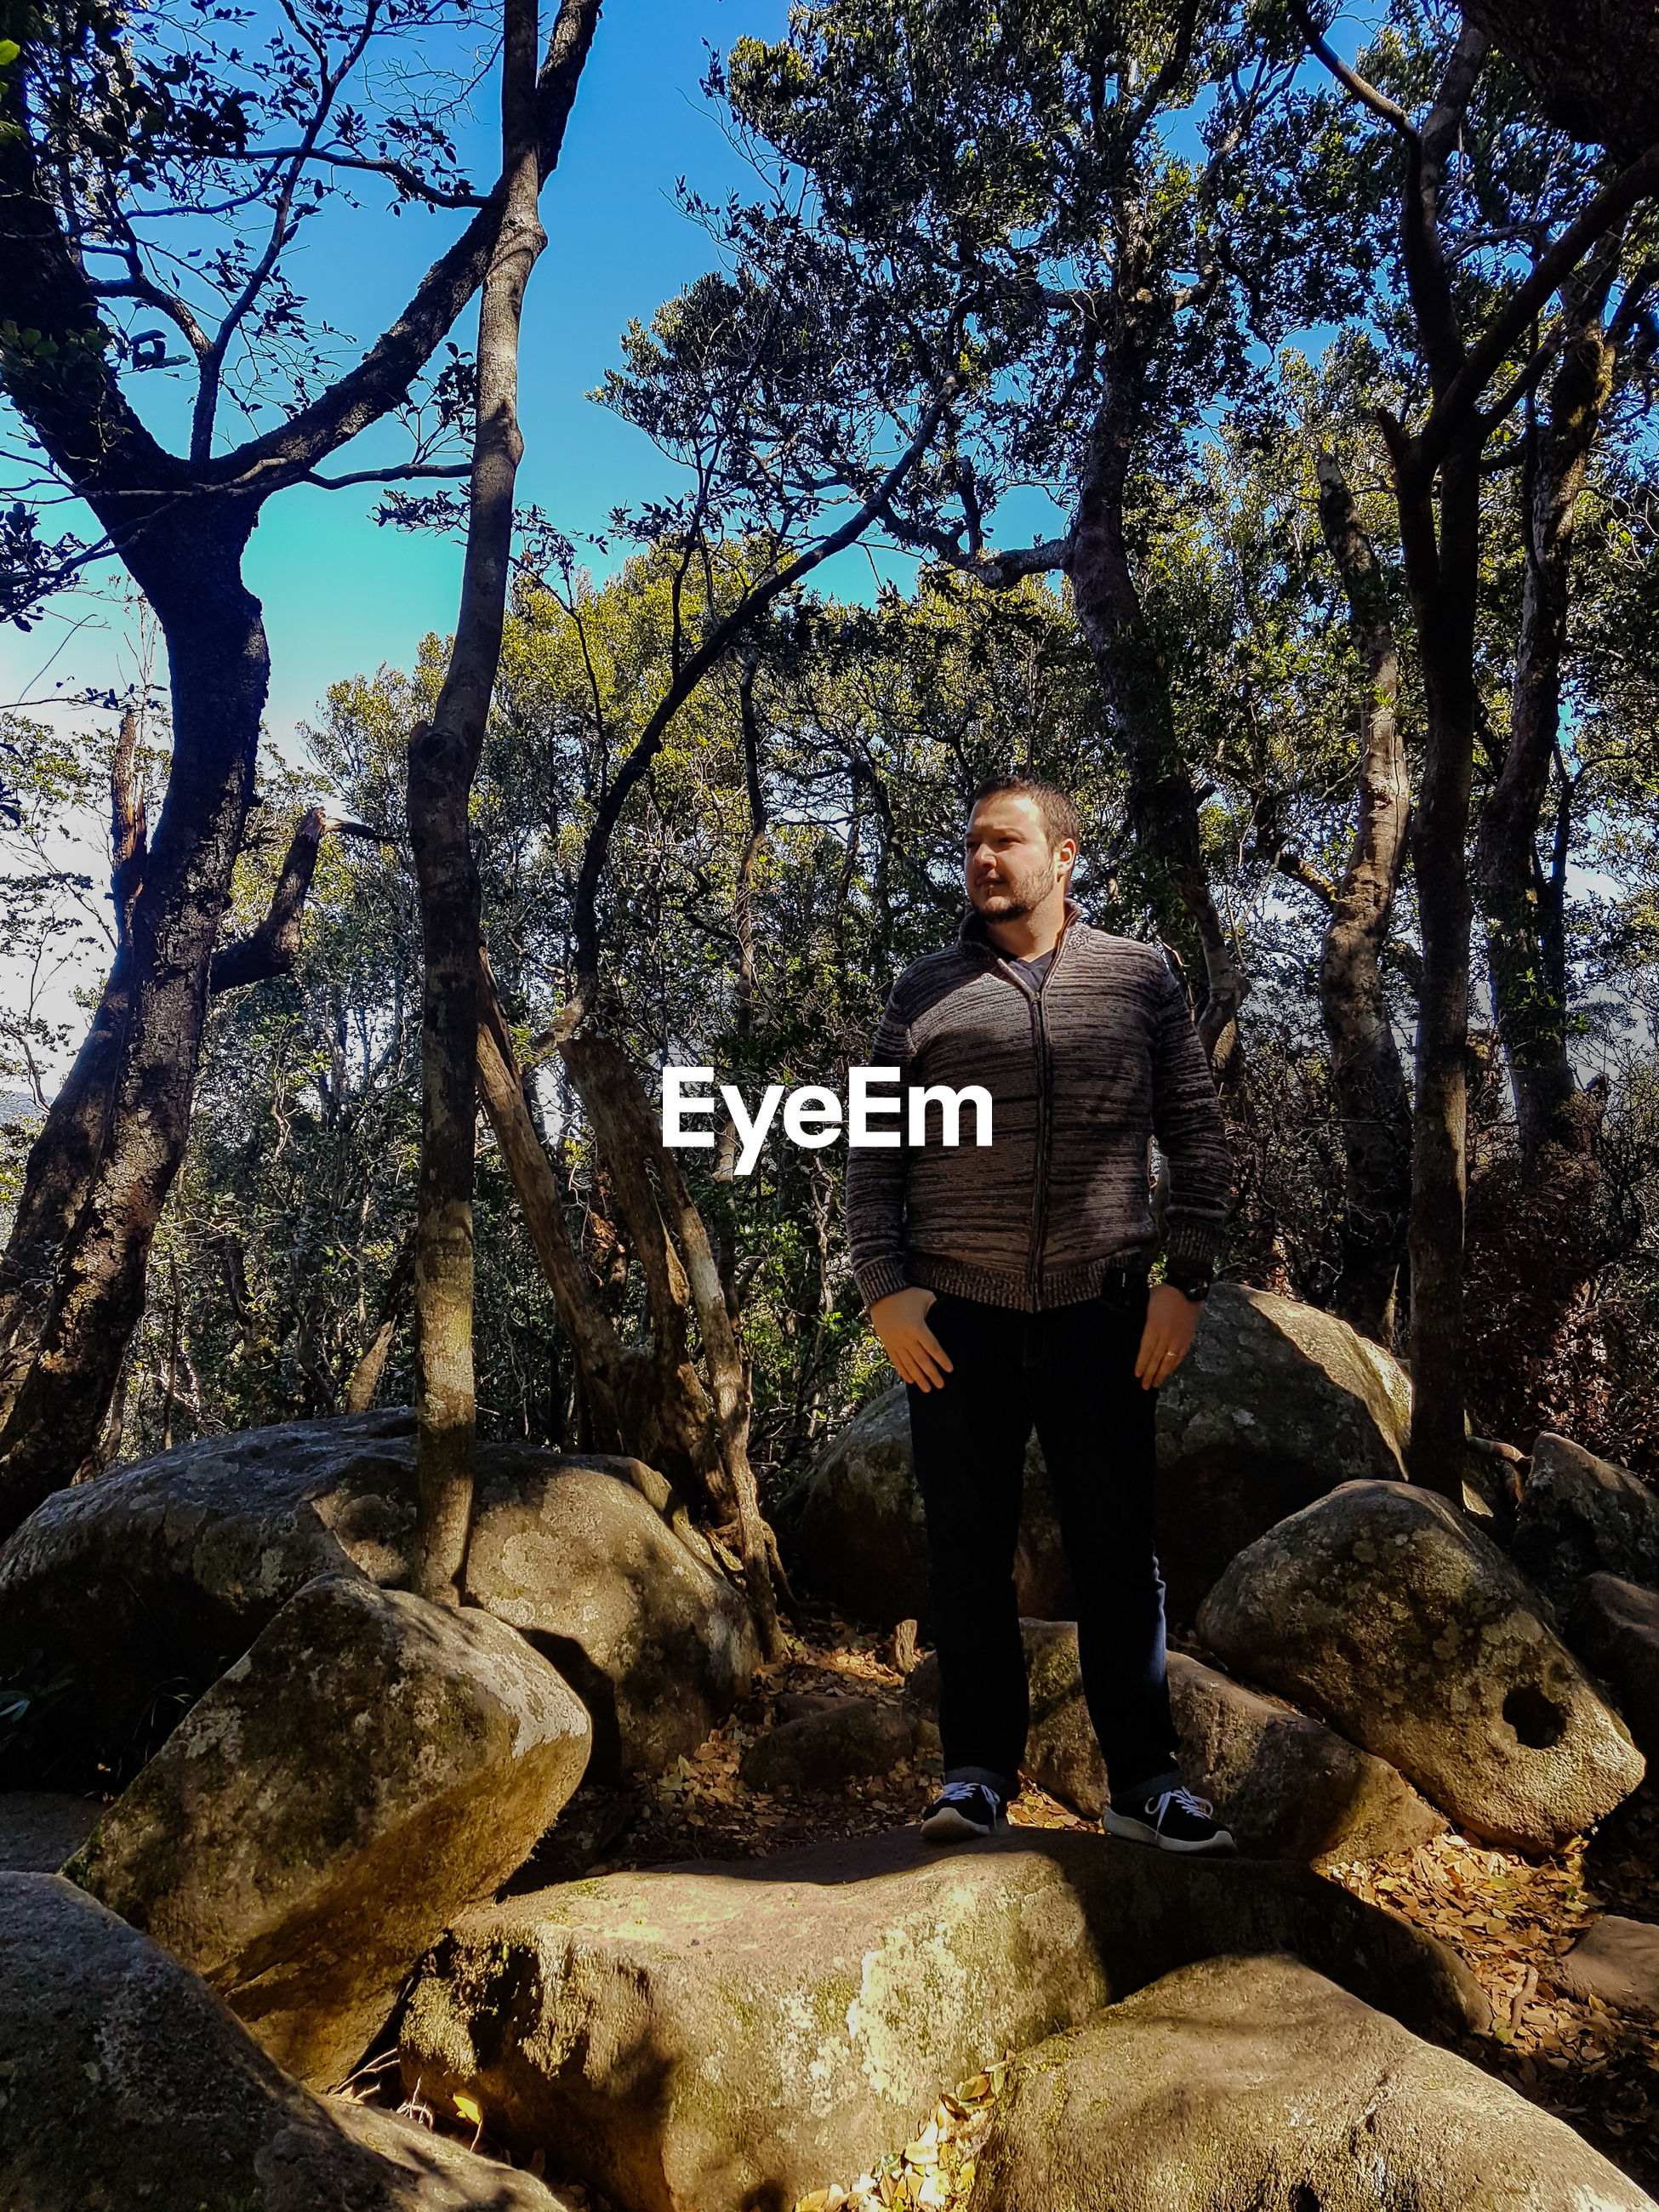 Man standing on rocks against trees